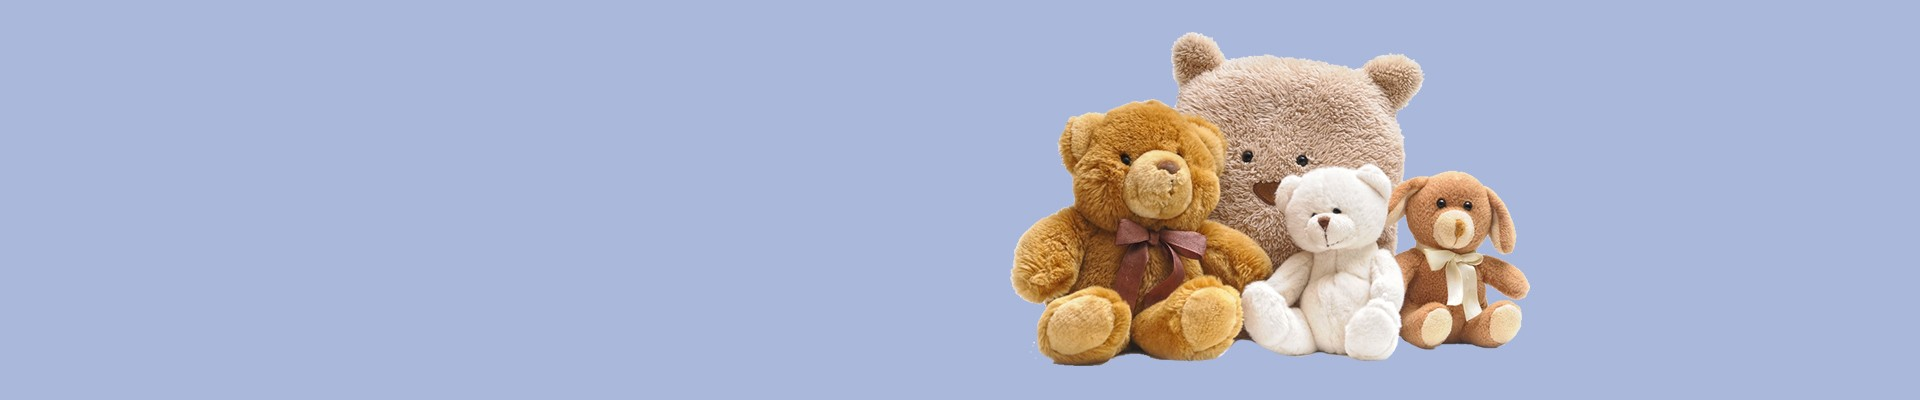 Jual Boneka Lucu Terbaik   Berkualitas - Pilihan Lengkap c118abc04f